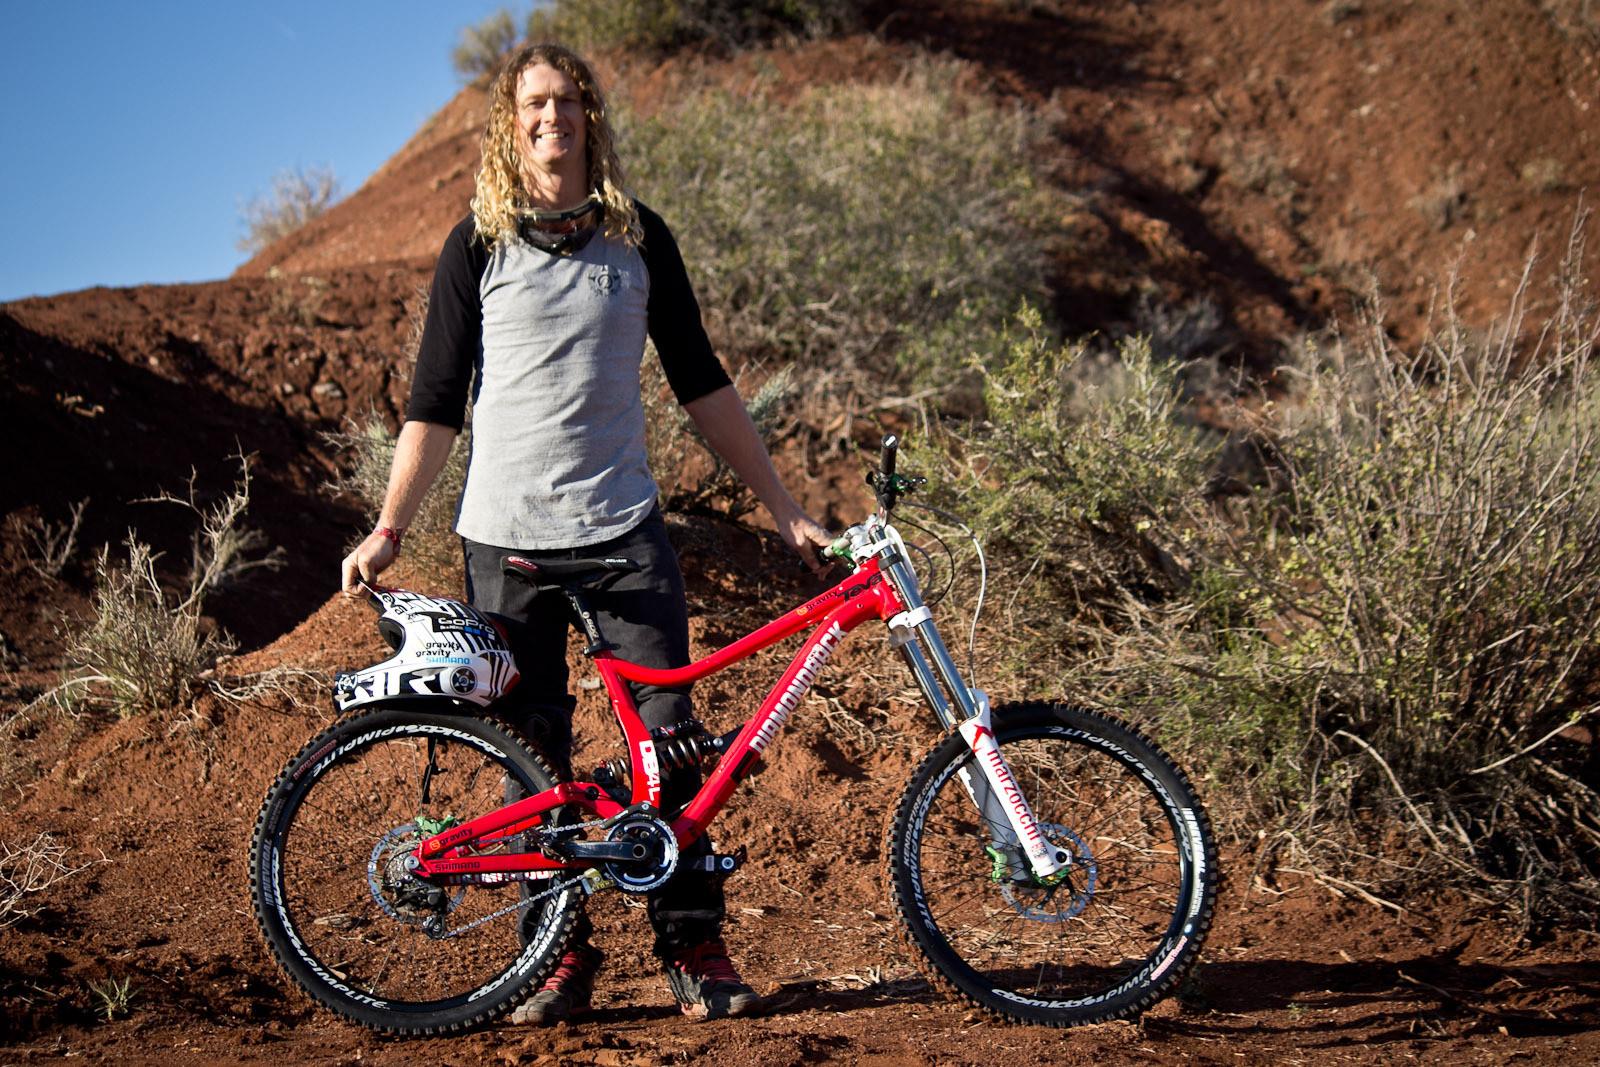 Rampage Pro Bike: Kelly McGarry's Diamondback DB8 - Rampage Pro Bike: Kelly McGarry's Diamondback DB8 - Mountain Biking Pictures - Vital MTB